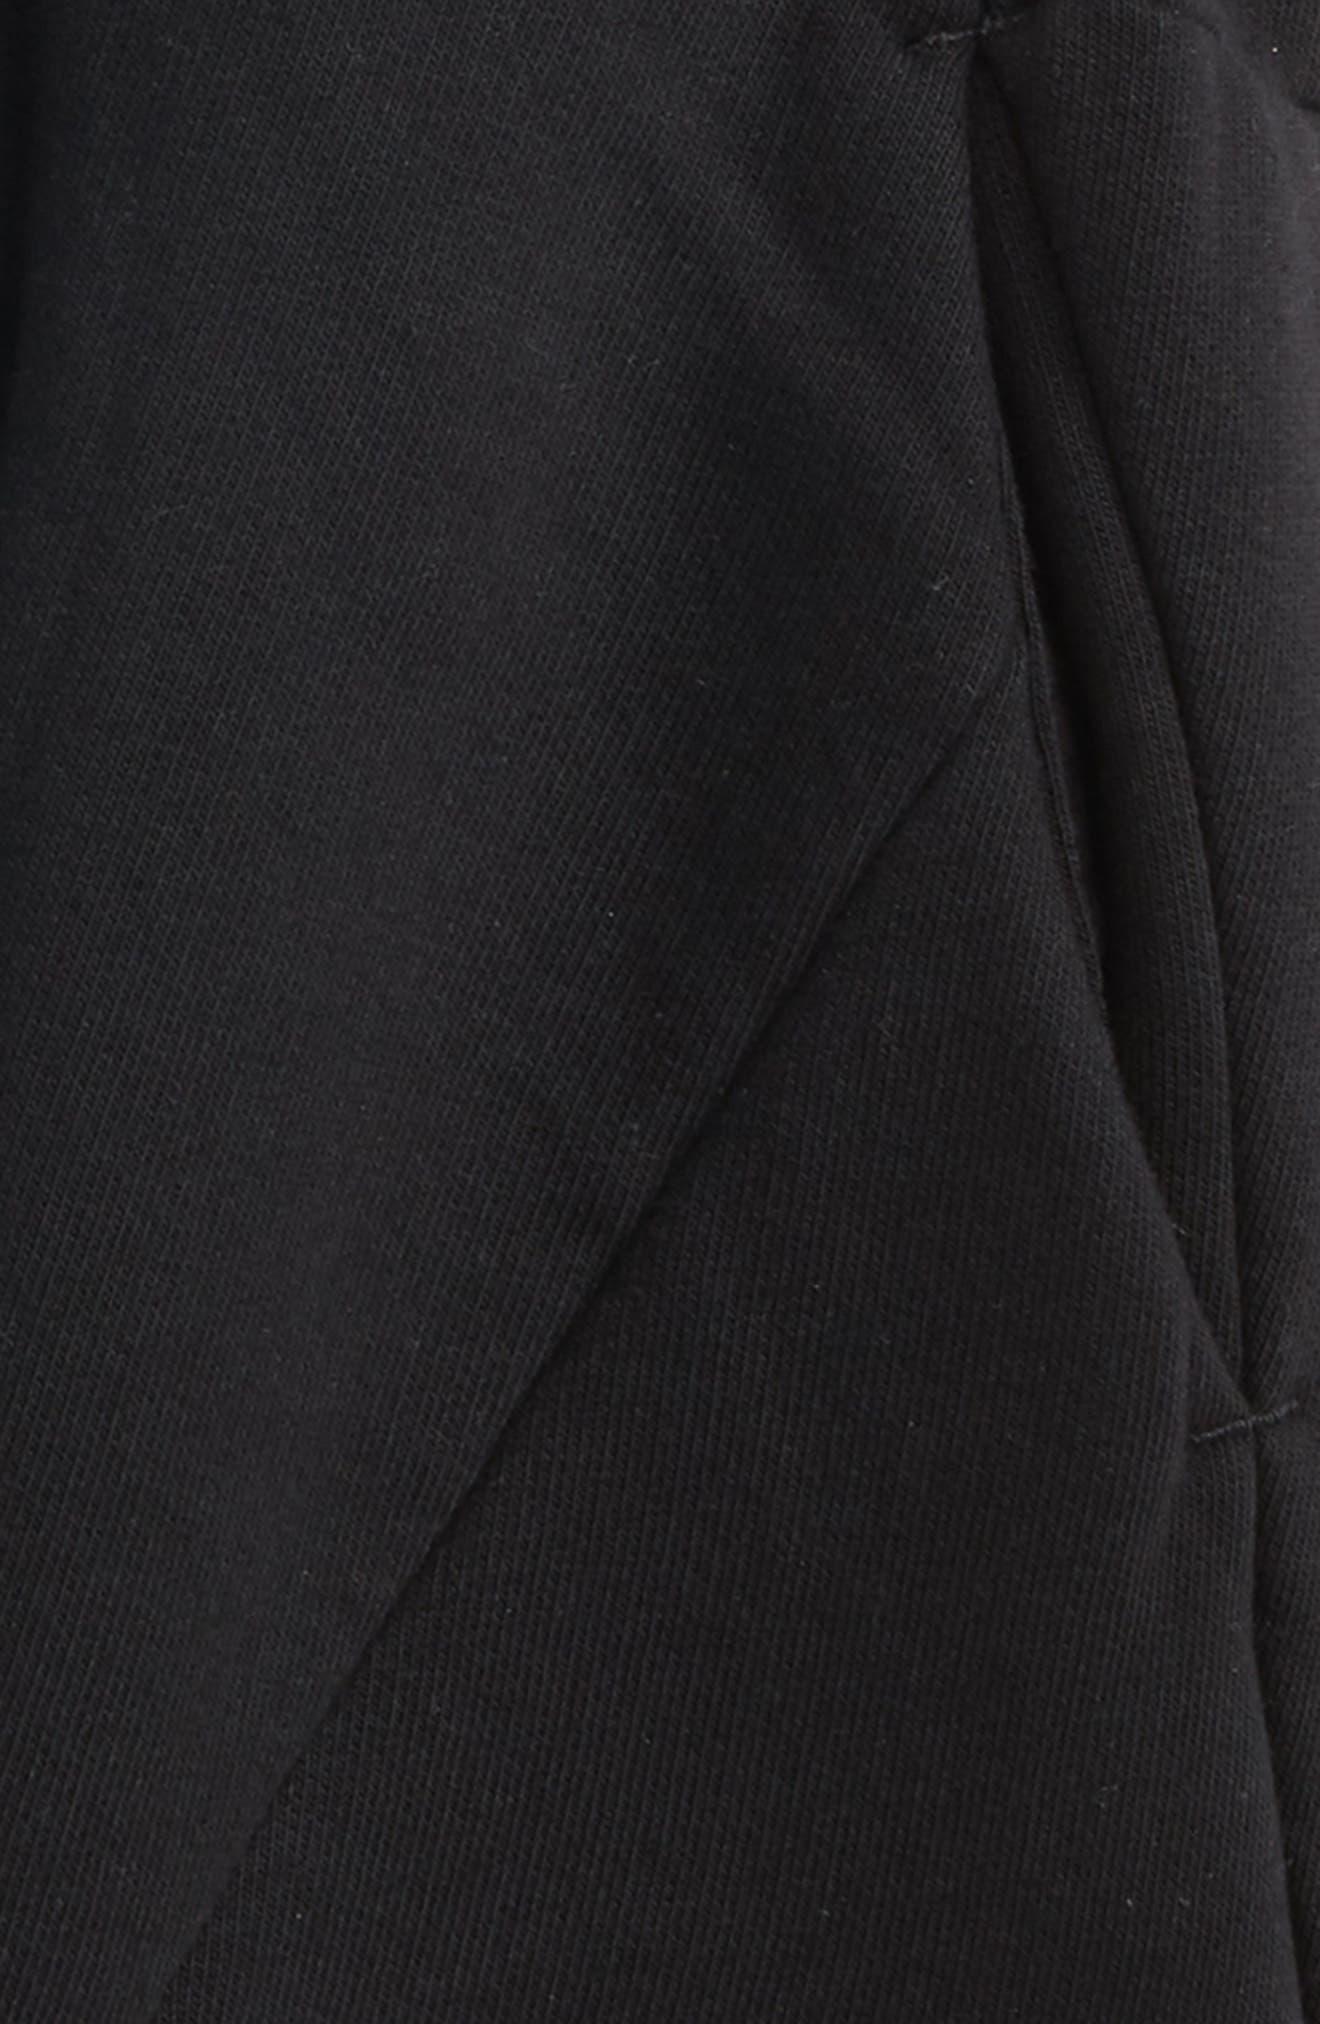 NUNUNU,                             Knit Shorts,                             Alternate thumbnail 2, color,                             001